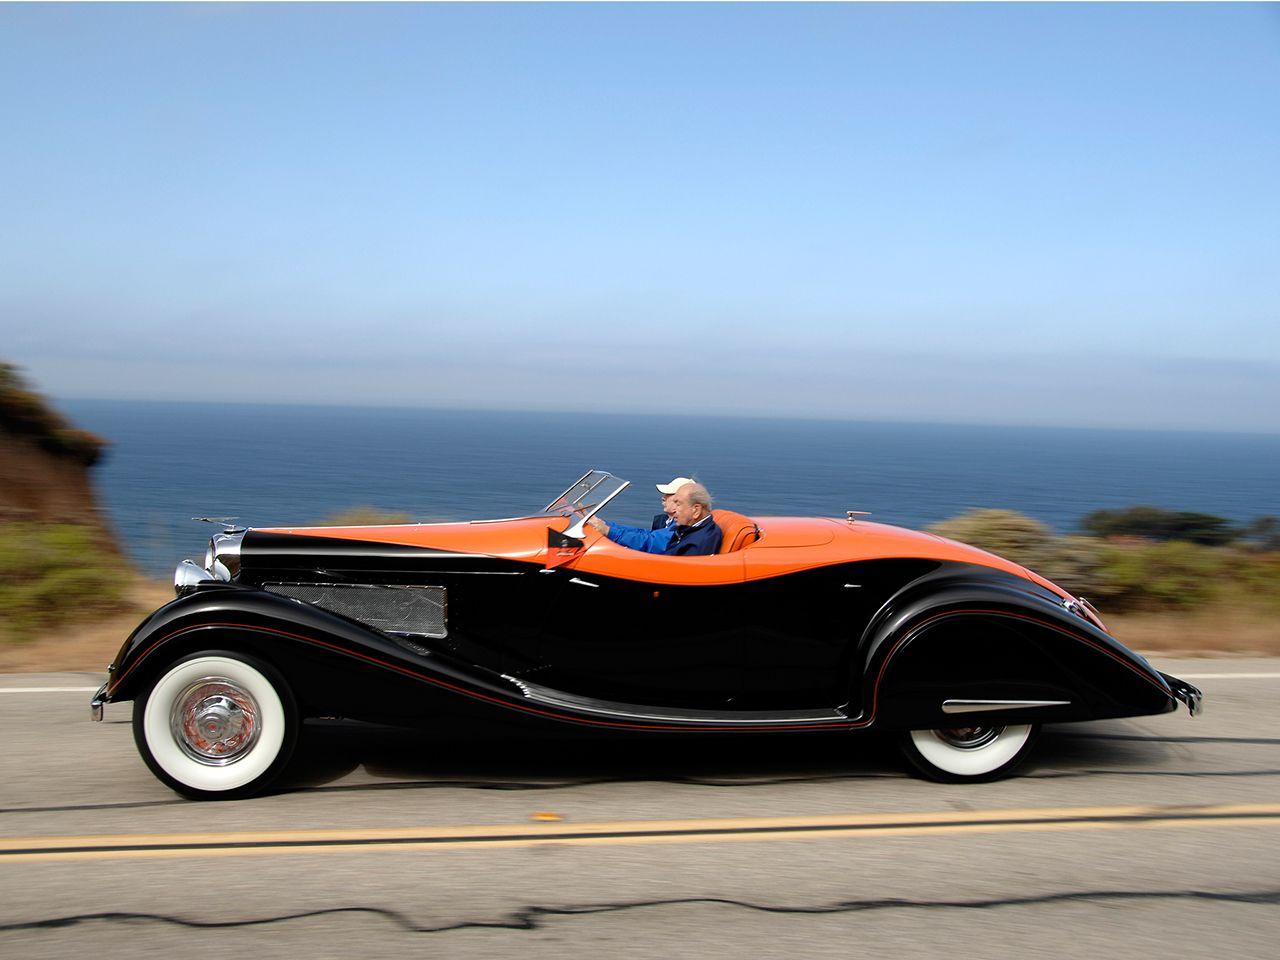 1935 Duesenberg SJ 585/2614 Convertible Coupe LWB by Gurney-Nutting